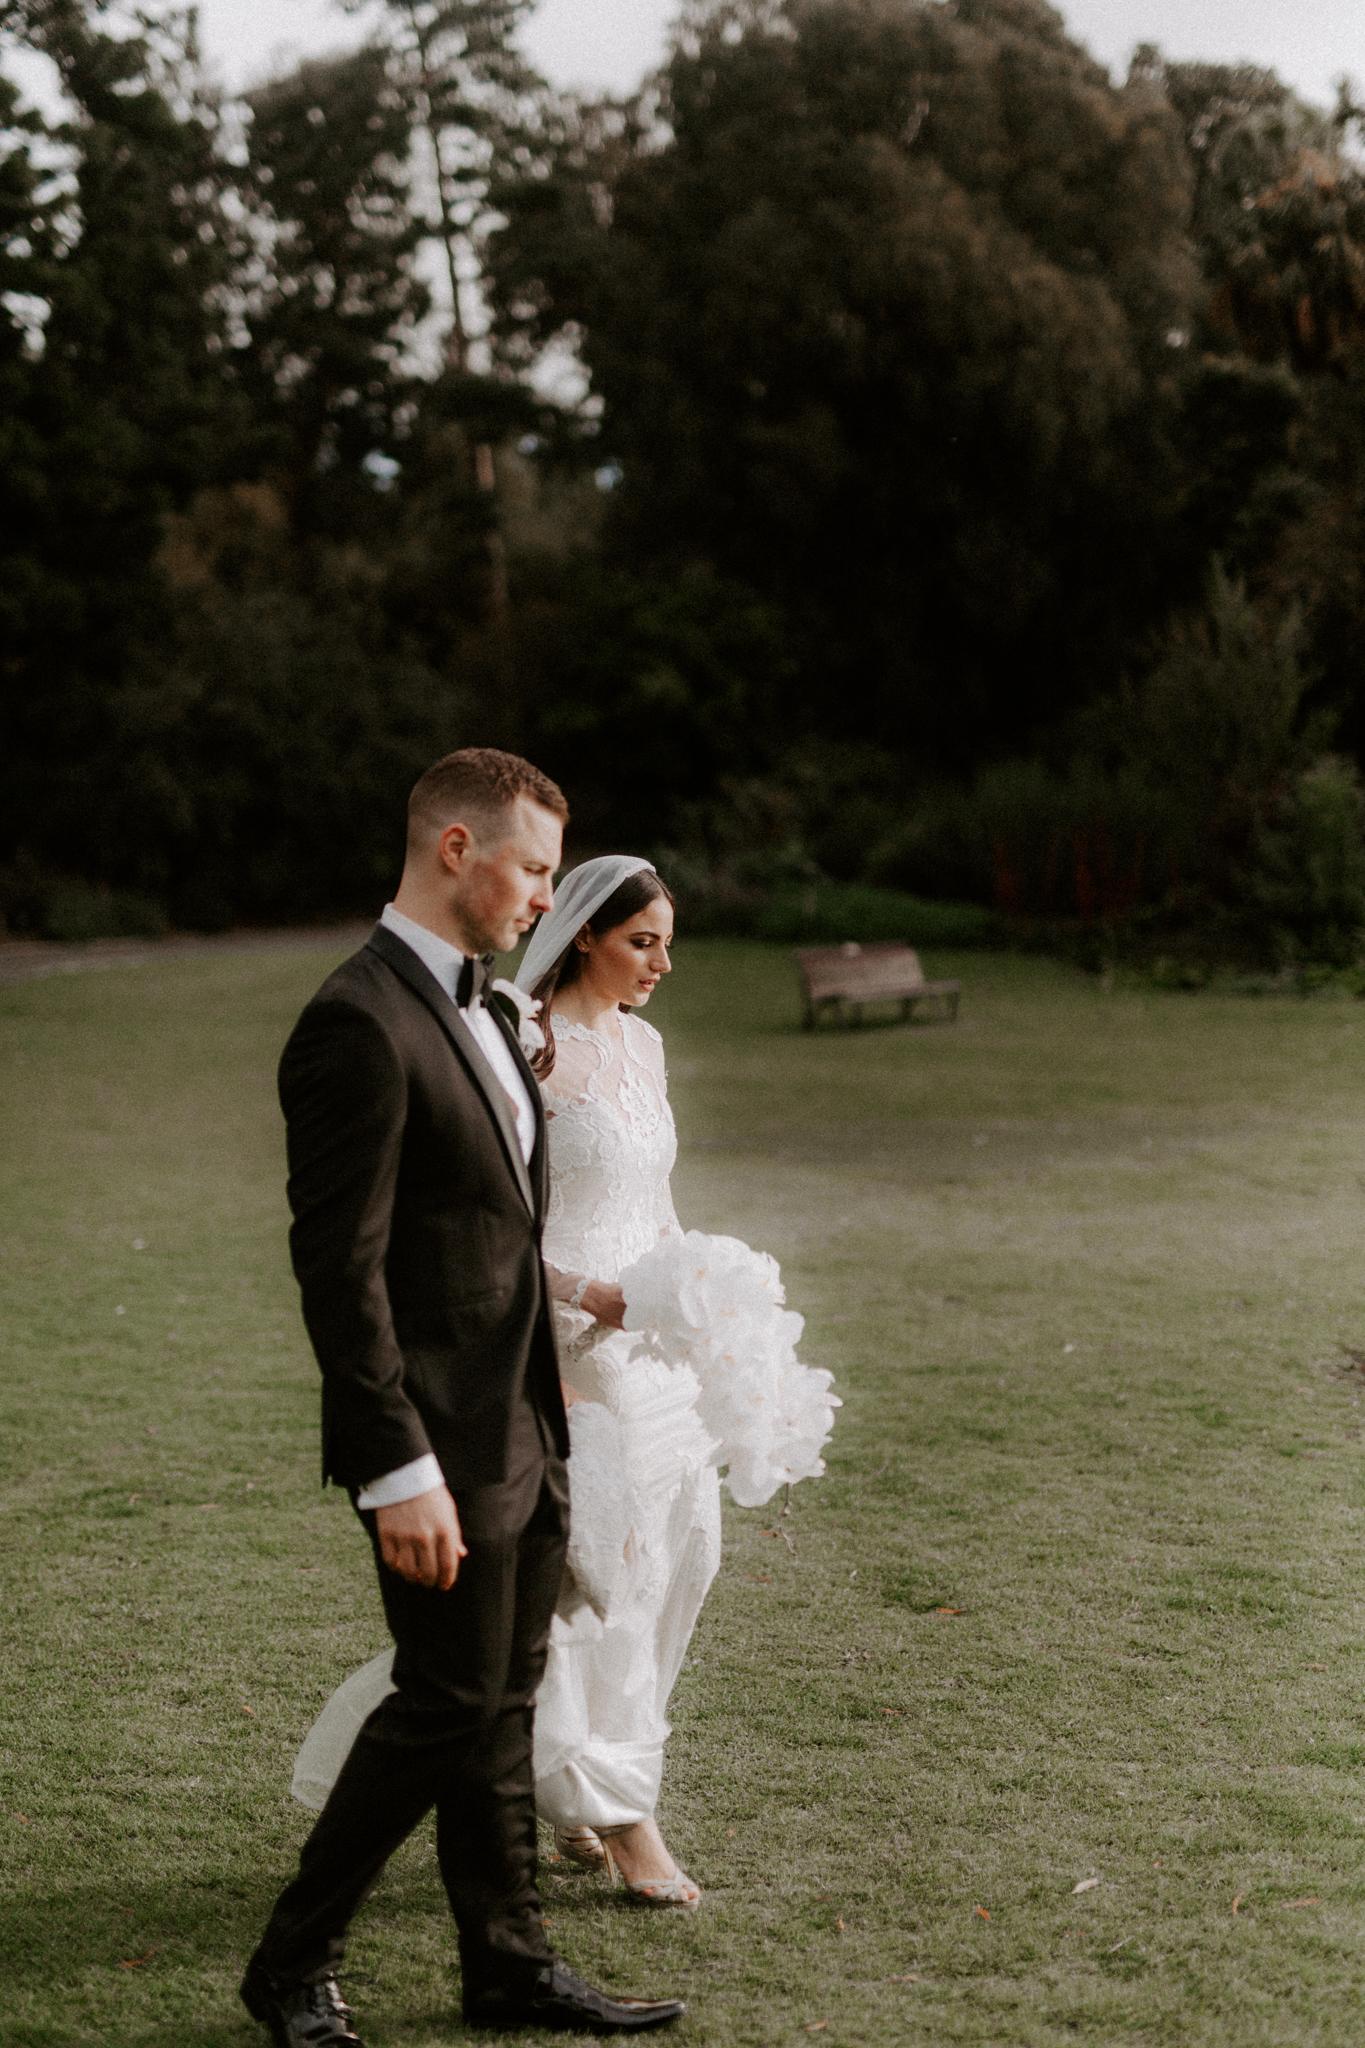 The-Terrace-Royal-Botanic-Gardens-Wedding-Emotions-and-Math-Photography-121.jpg